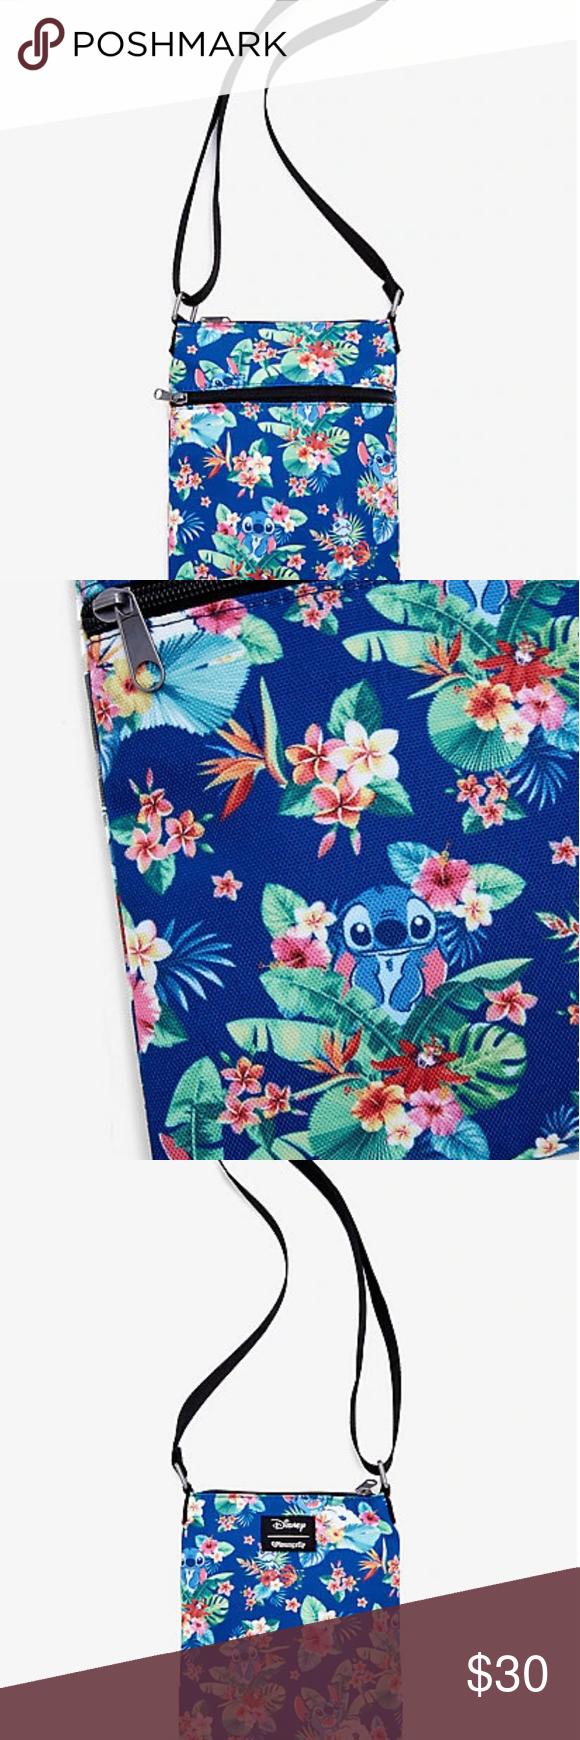 Disney Lilo & Stitch Floral Passport Crossbody Bag  Disney Lilo & Stitch Floral Passport Crossbody Bag #stitchdisney